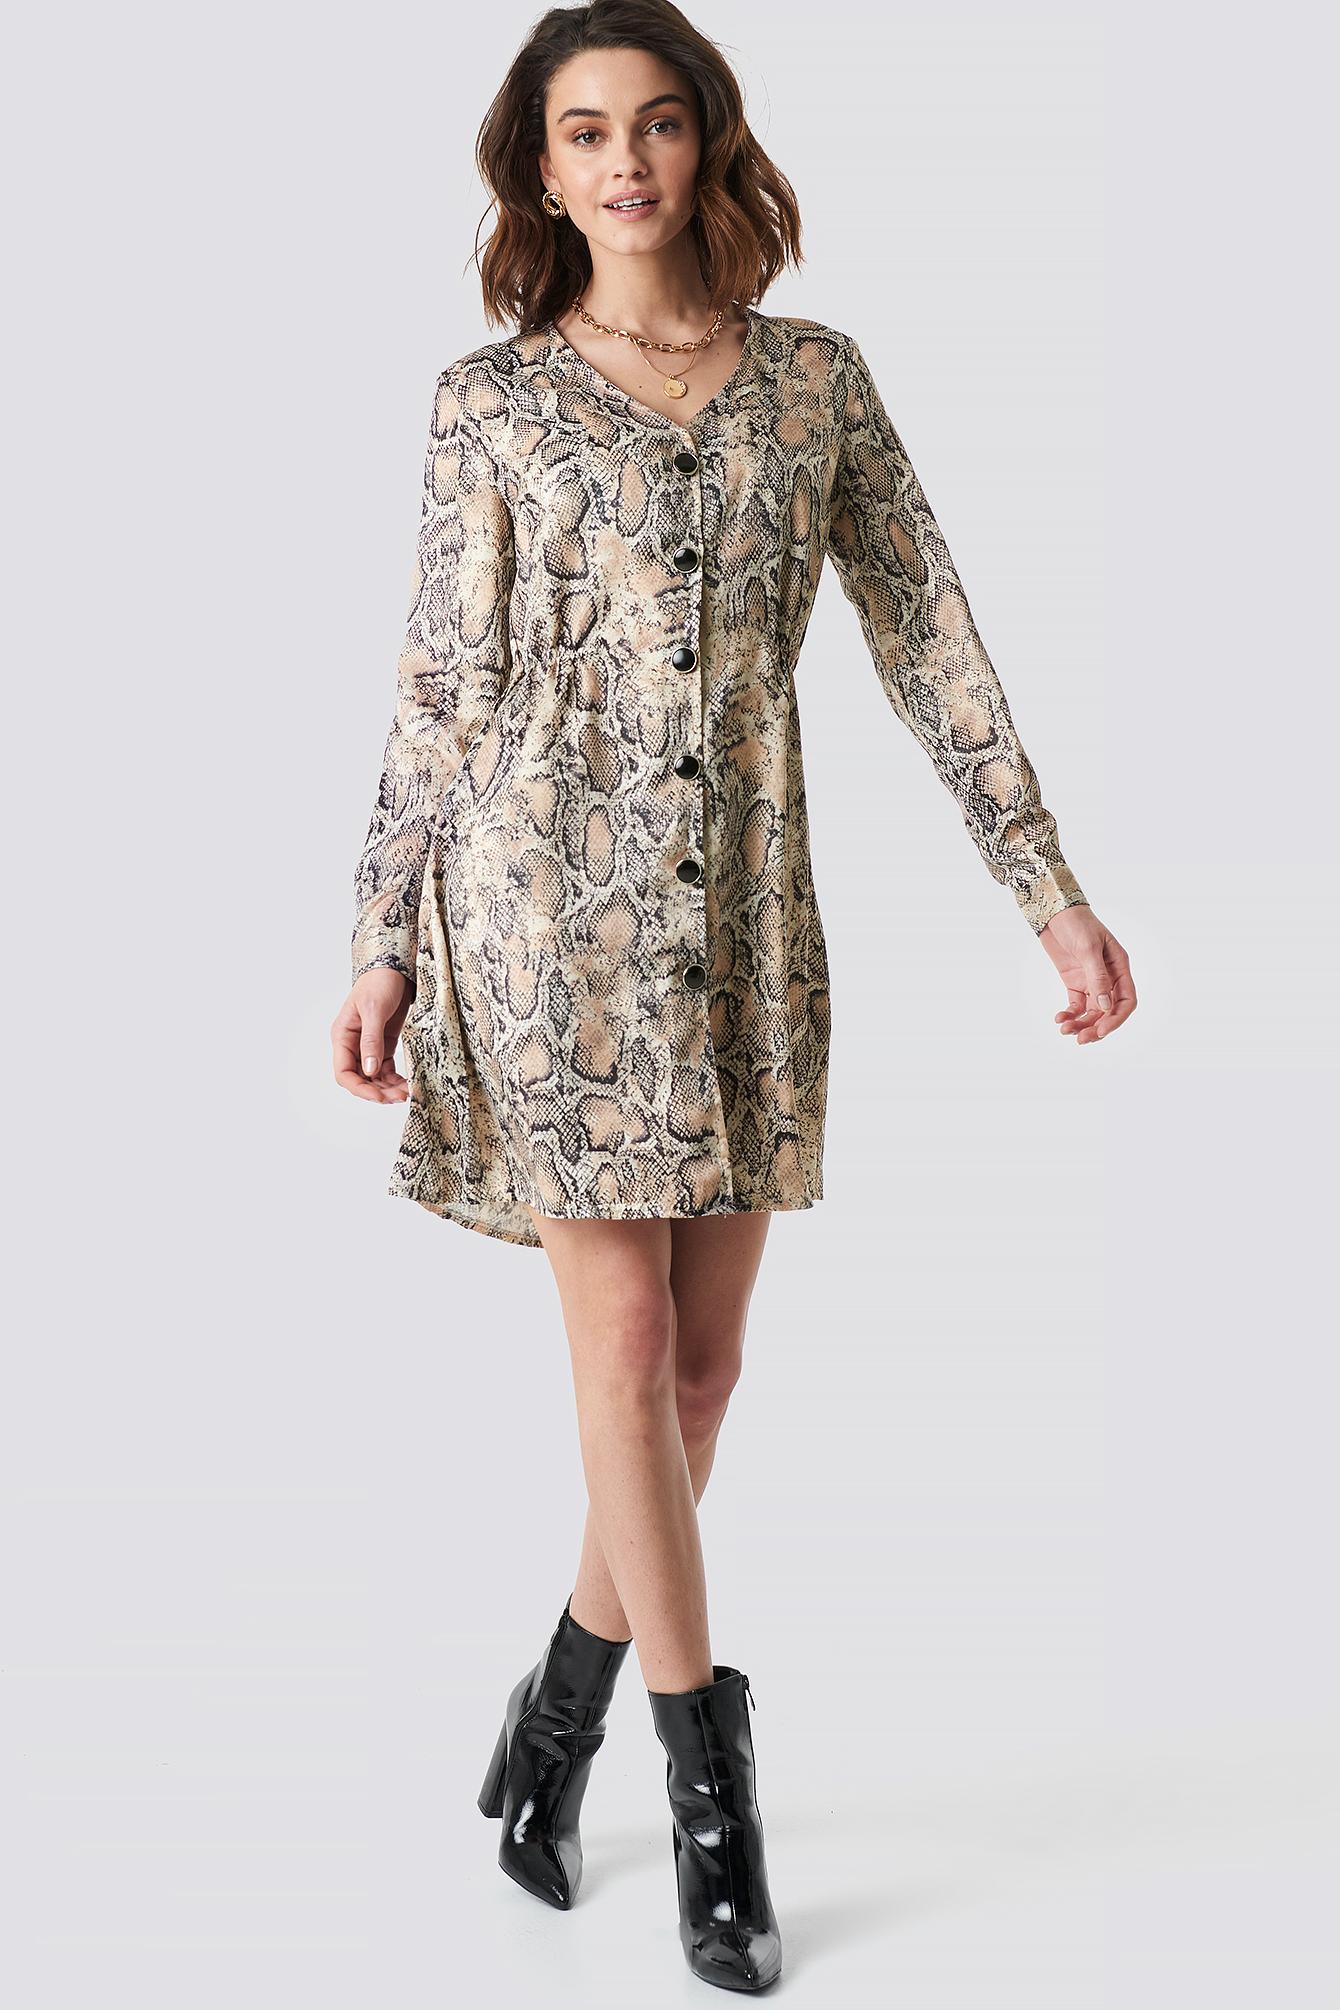 trendyol -  Snake Patterned Dress - Beige